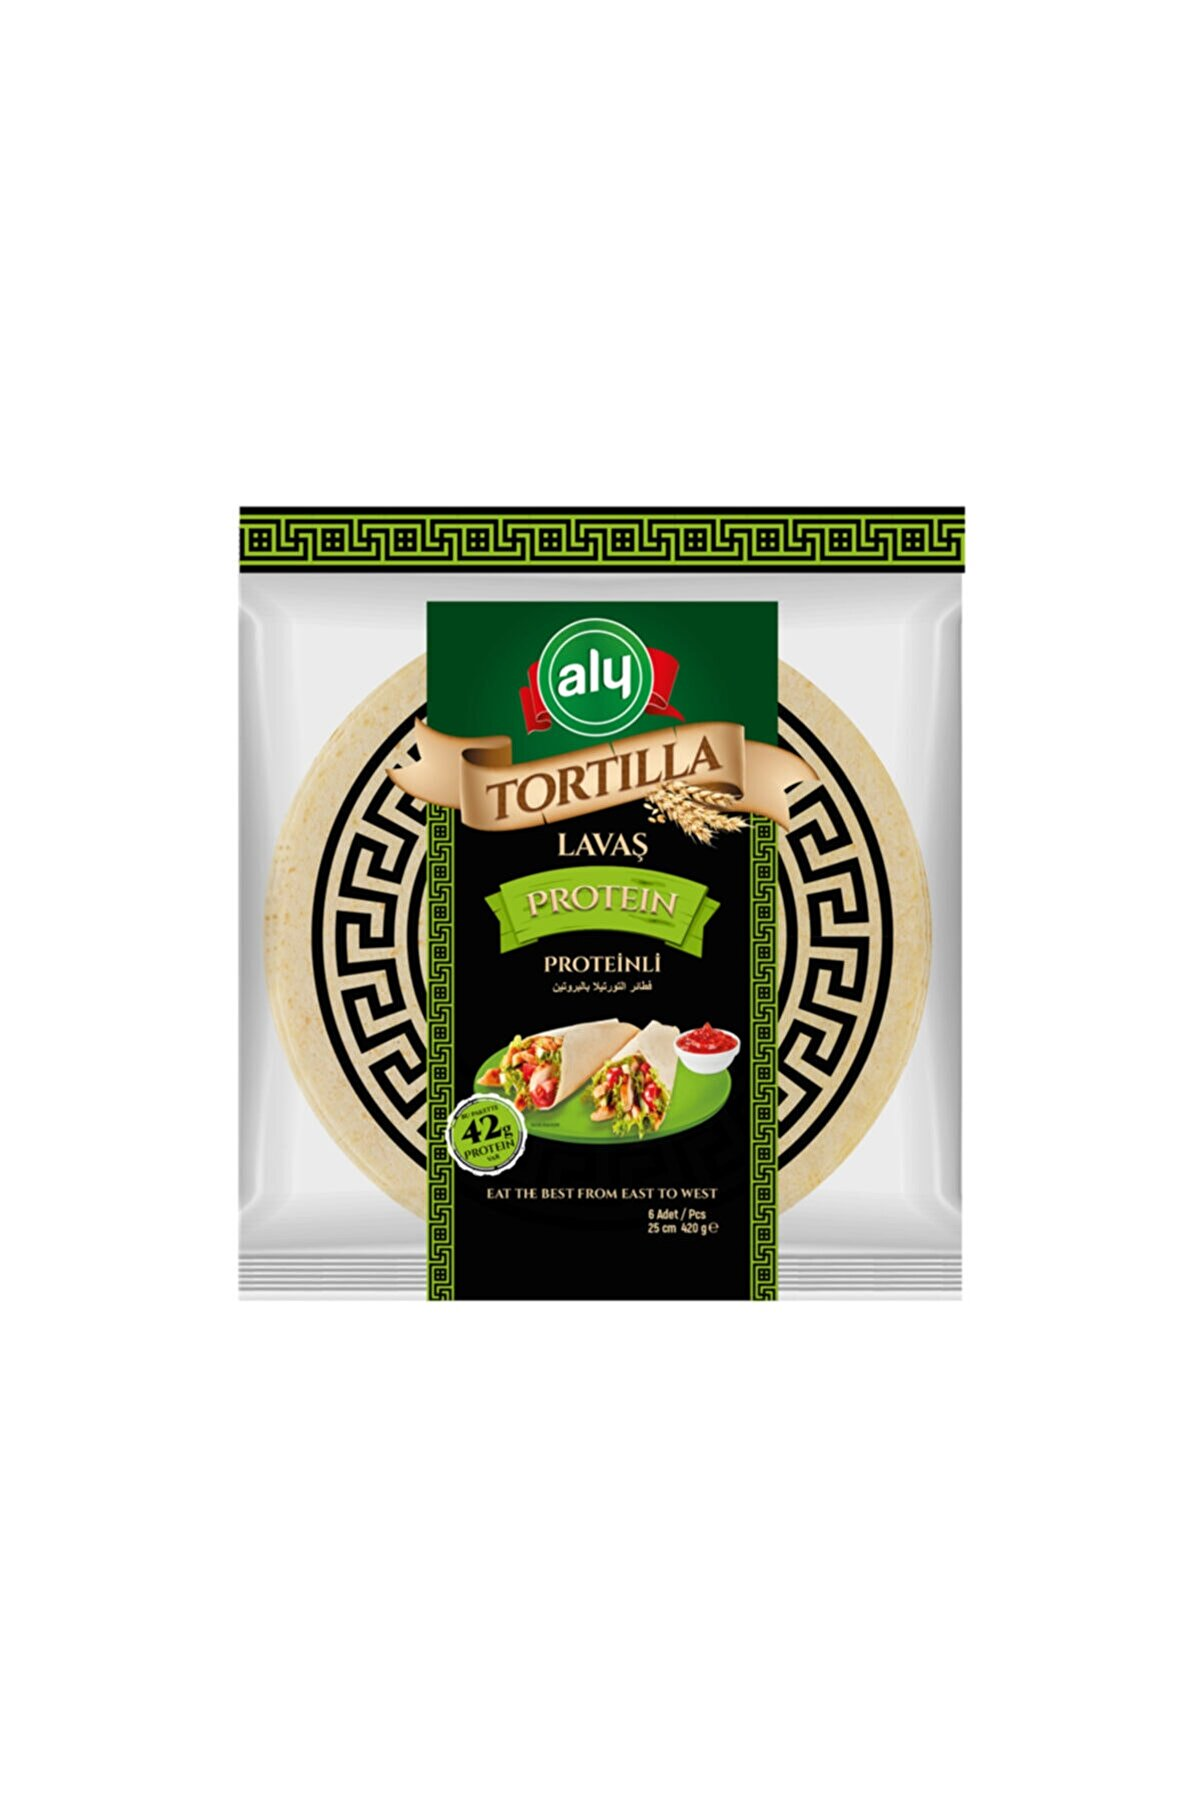 Aly Proteinli Tortilla Lavaş 25 cm 6'lı Paket 420 g